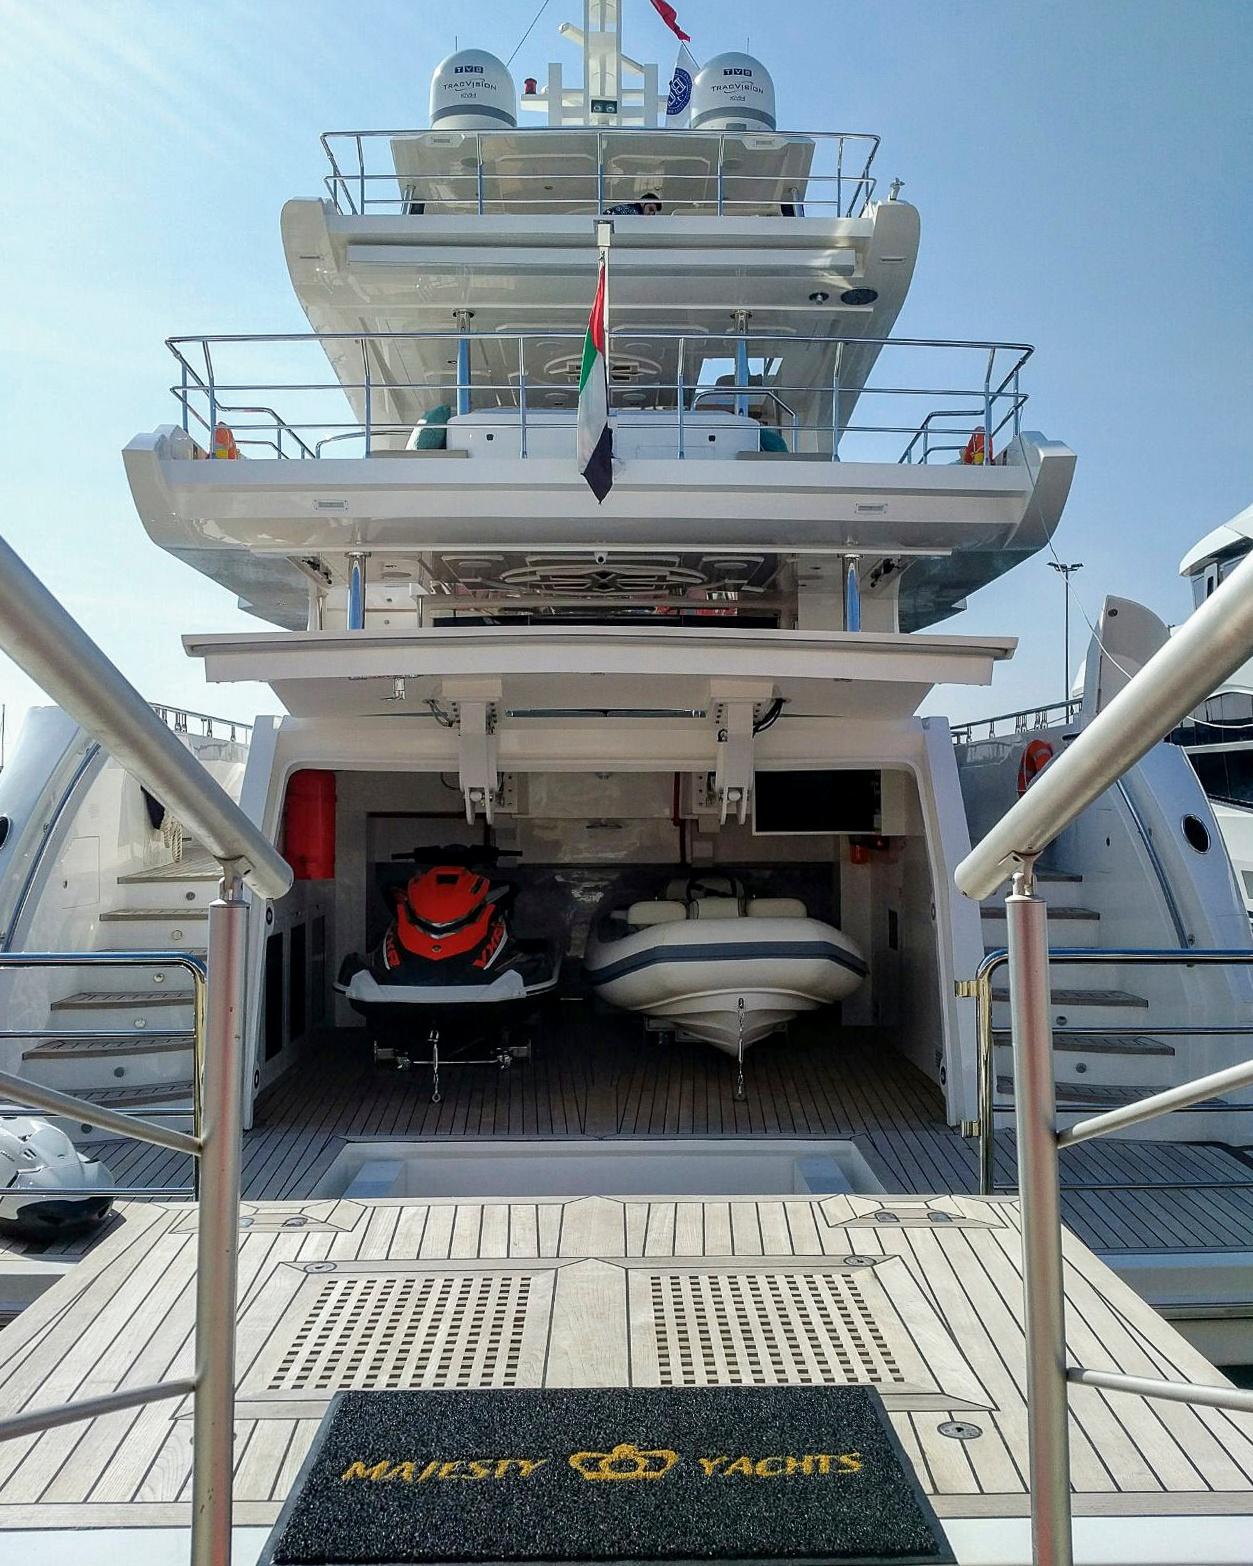 Gulf Craft at Tuzla Boat Show 2018 (15).jpg